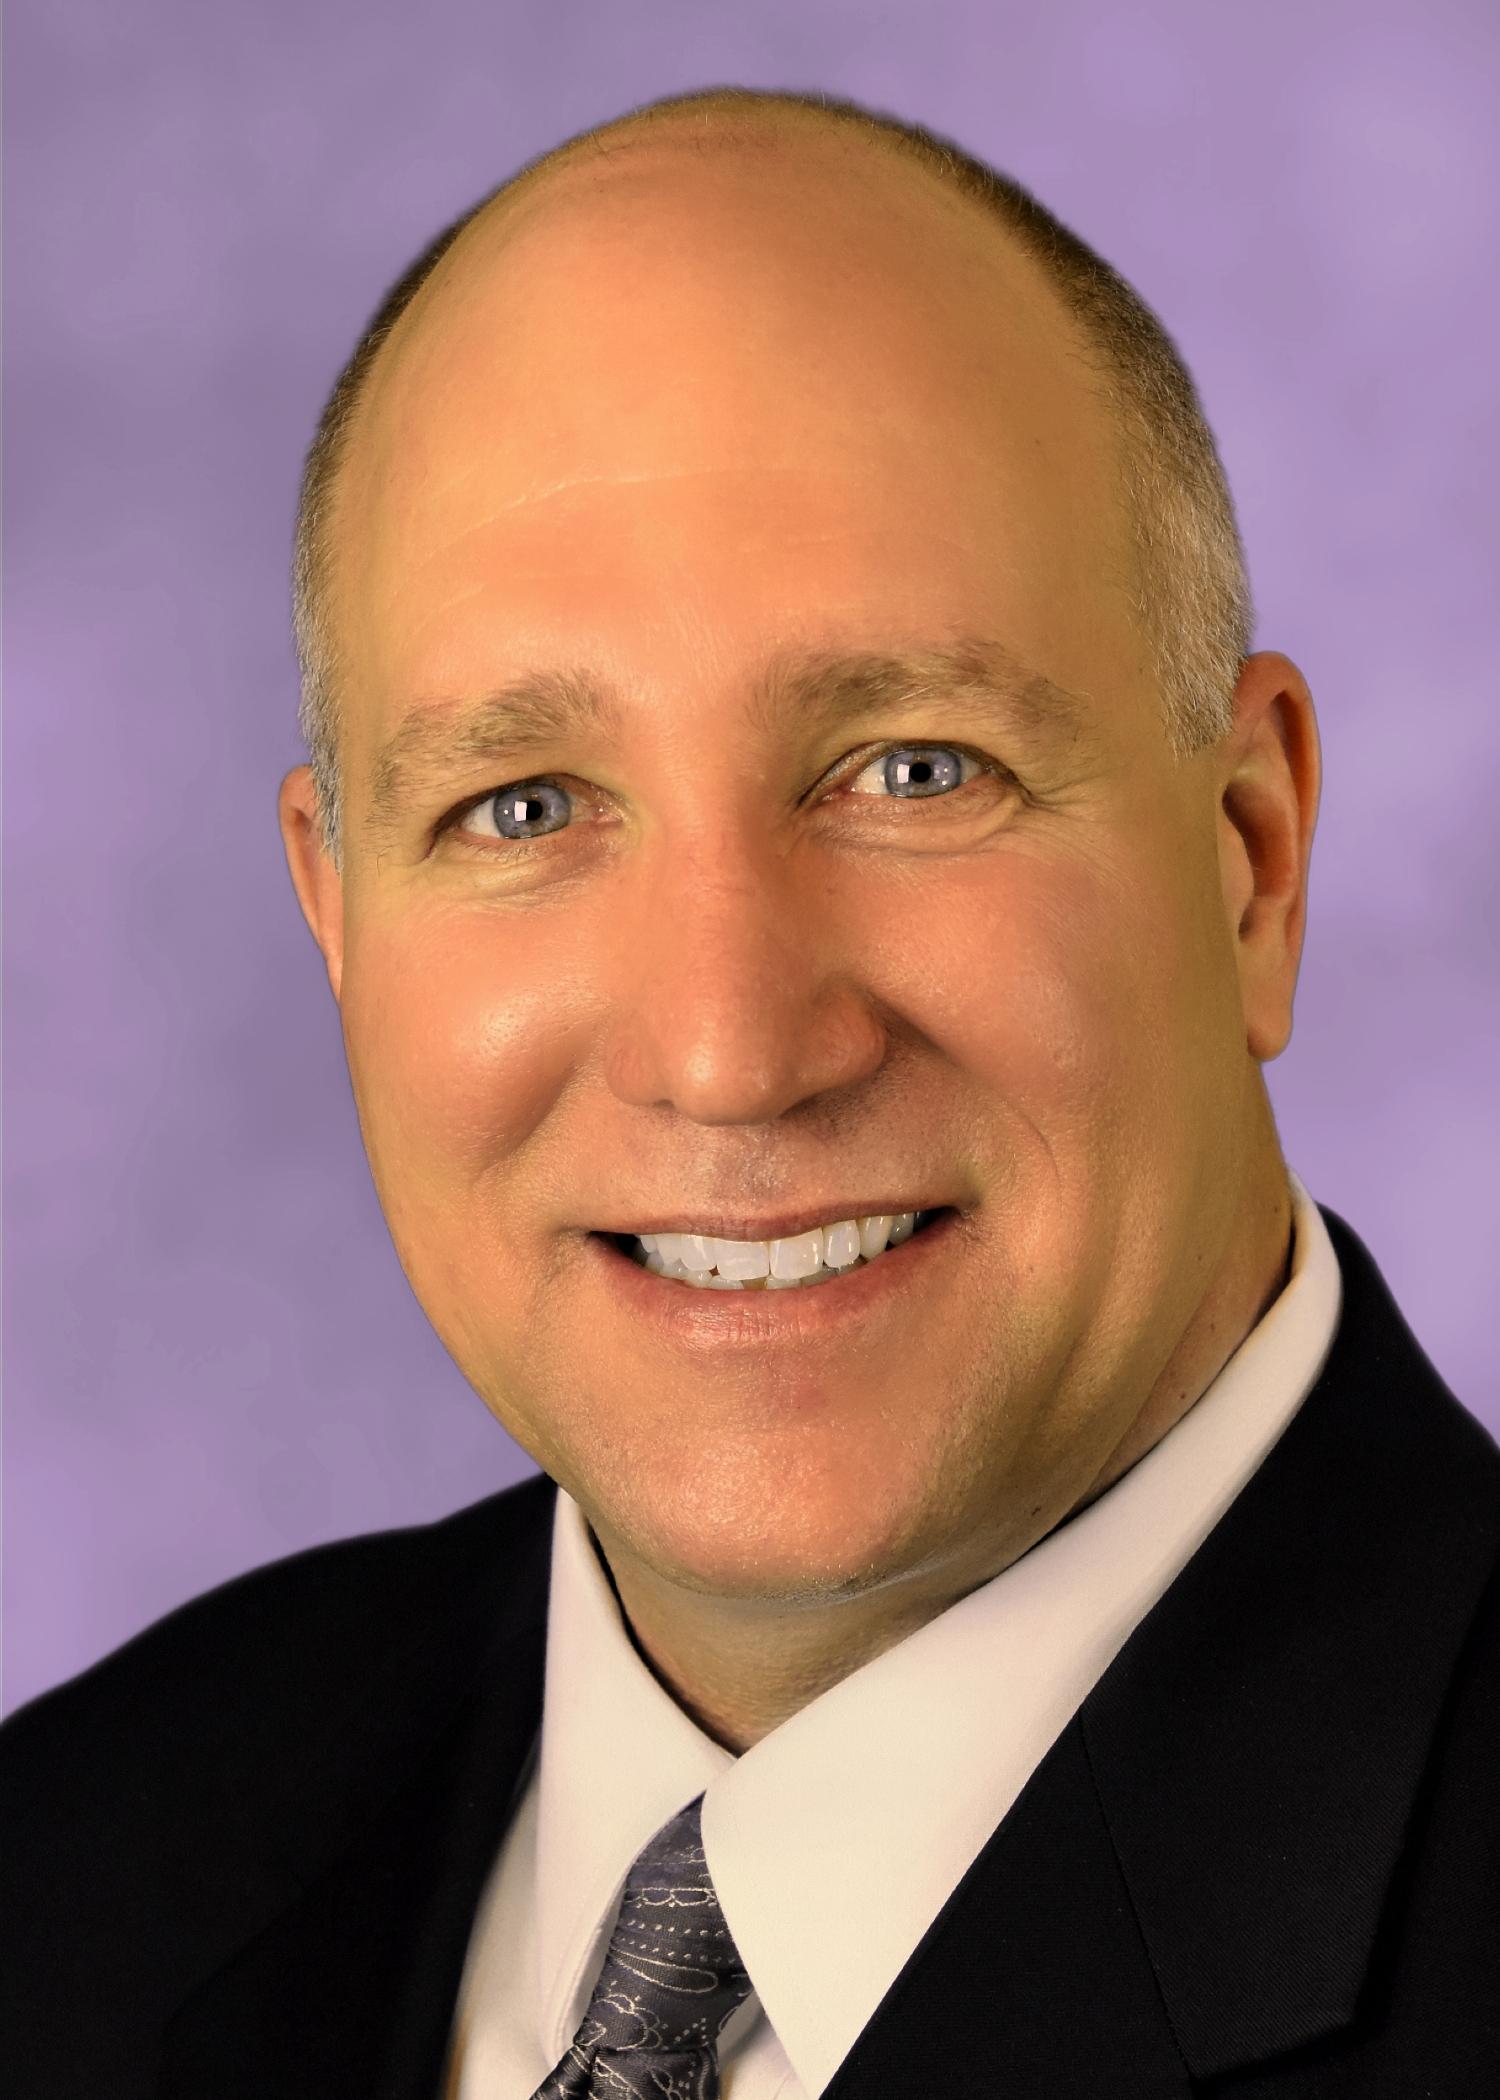 Dr. Jeffrey M. Cullers, DC, BS, LMT, BCTMB